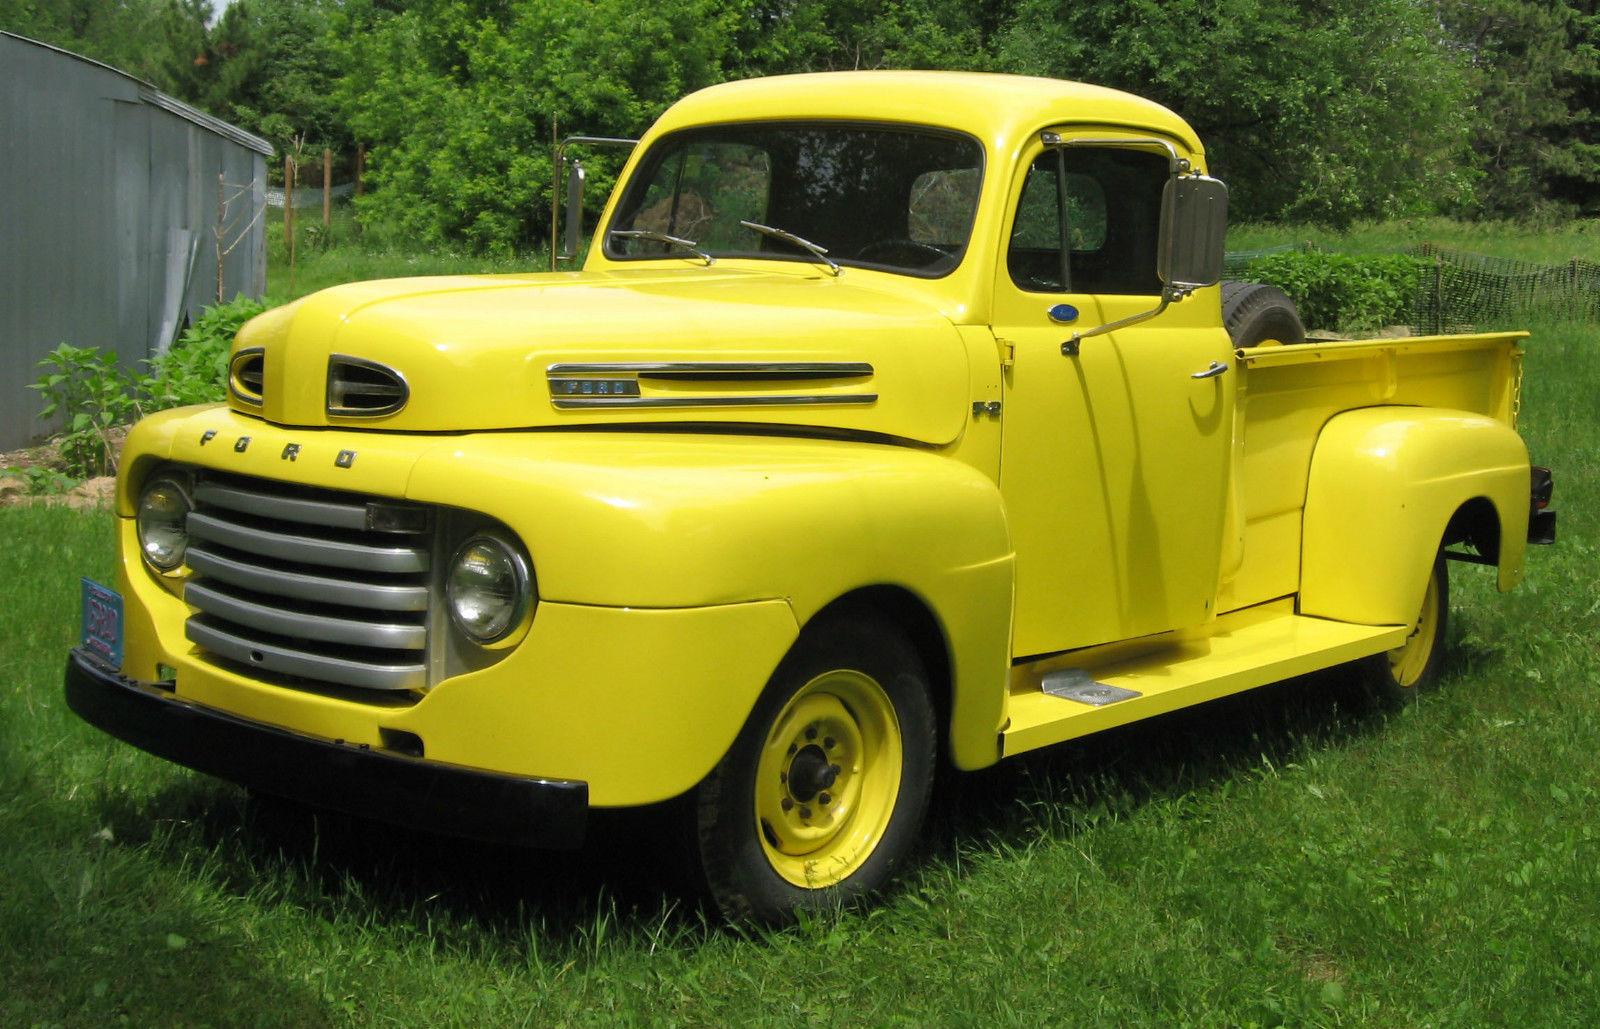 1950 ford f2 3 4 ton rebuilt flathead v8 for sale in menomonie wisconsin united states